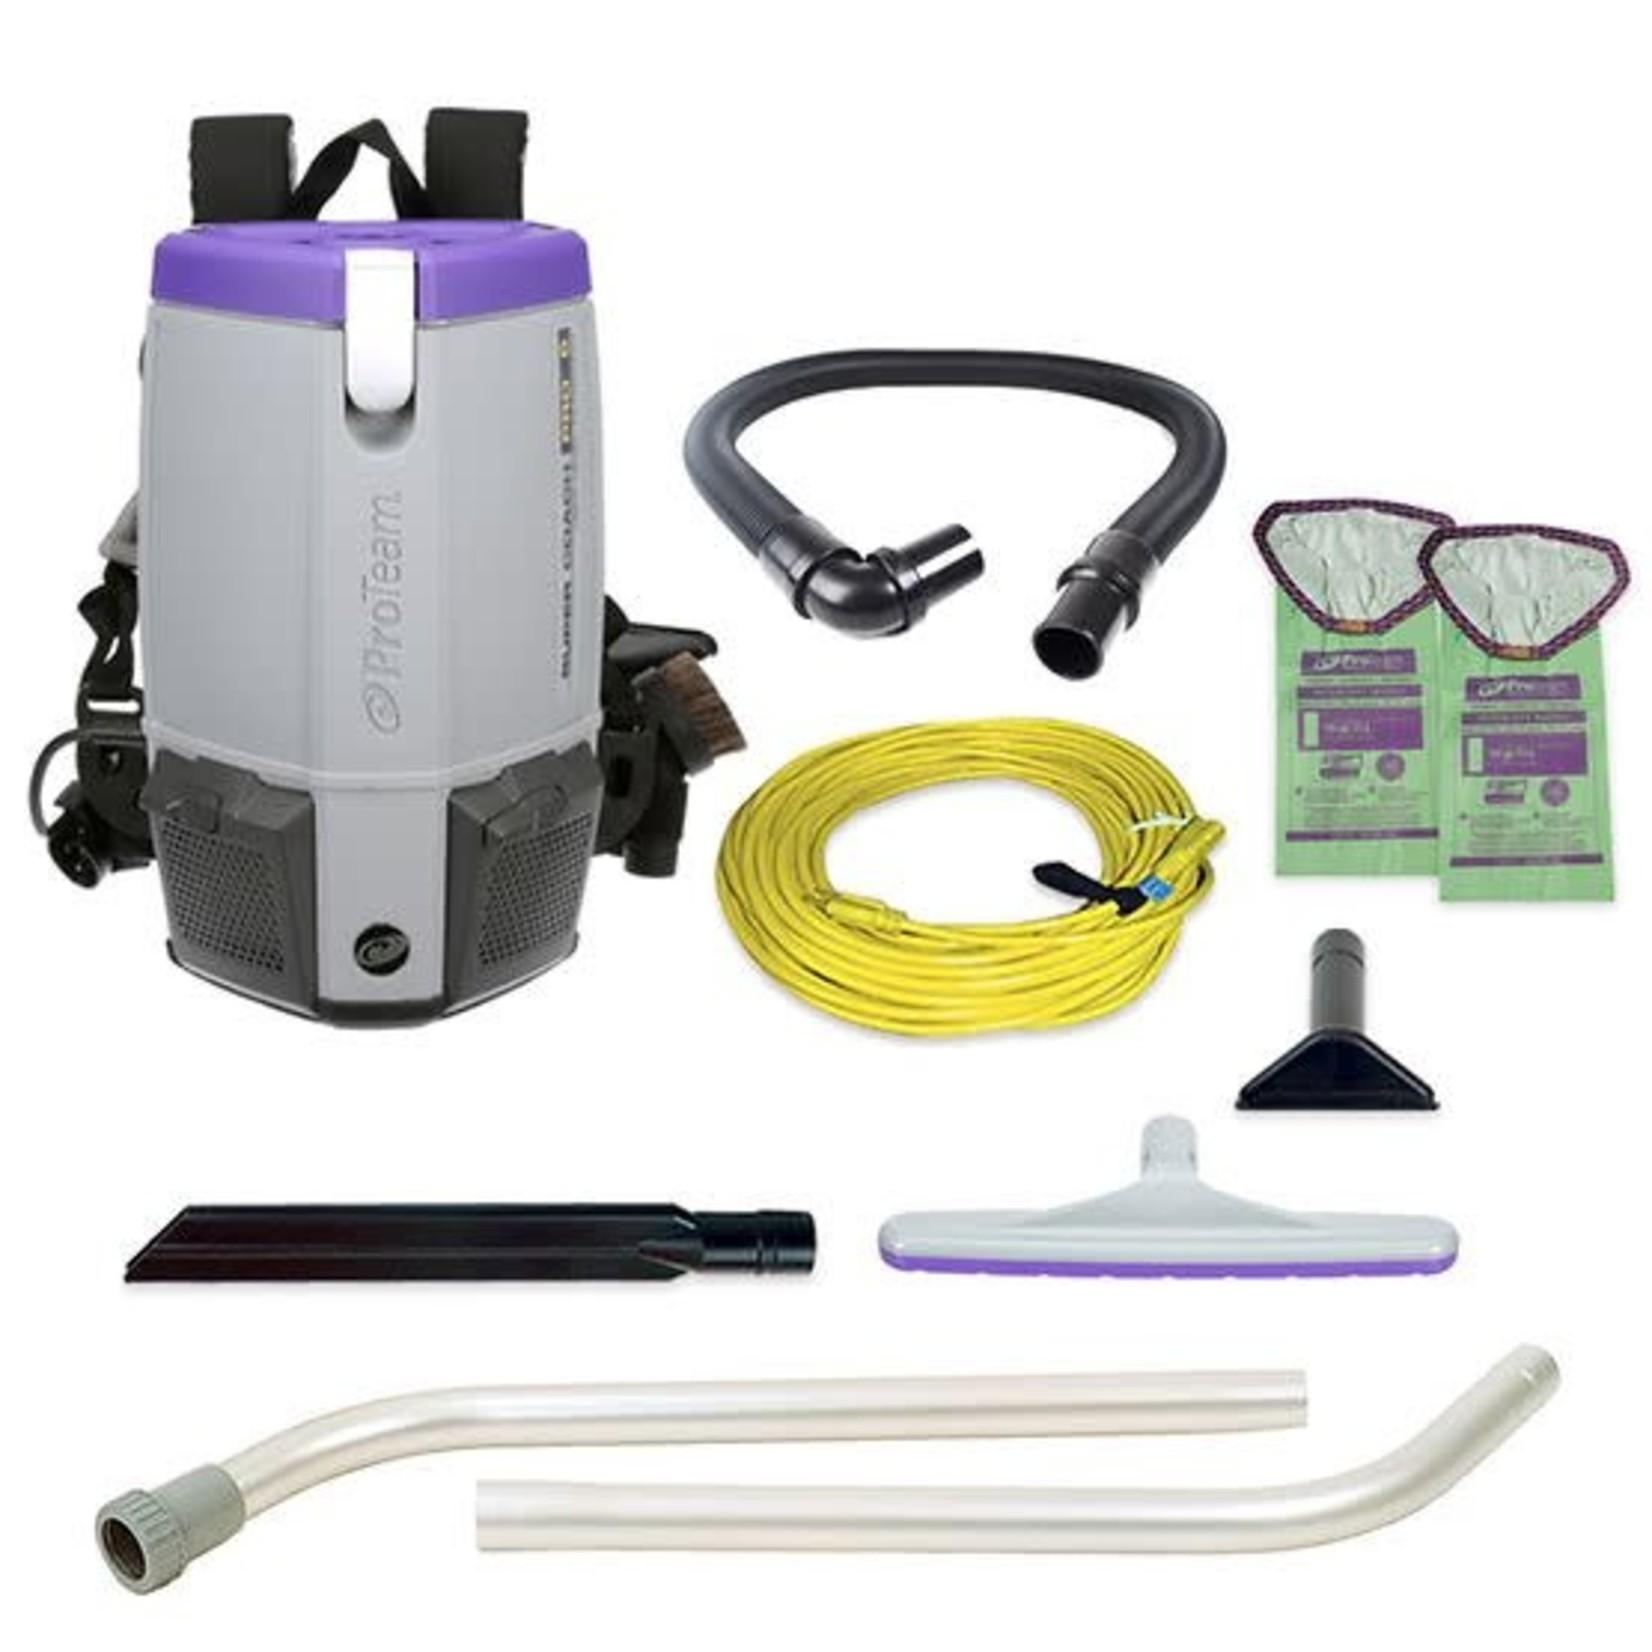 ProTeam Commercial Vacuums SUPER COACH PRO 6